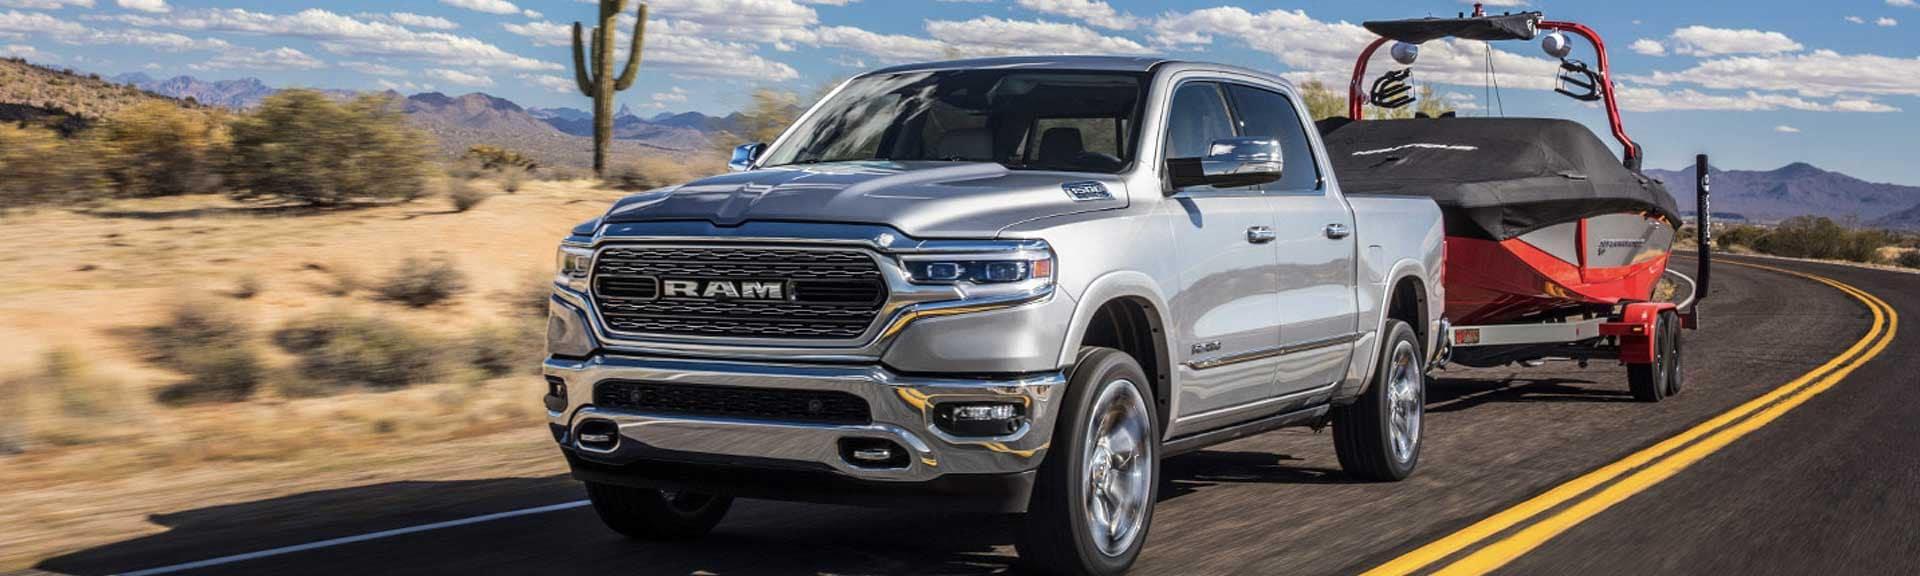 2019 Ram 1500 Towing Capacity